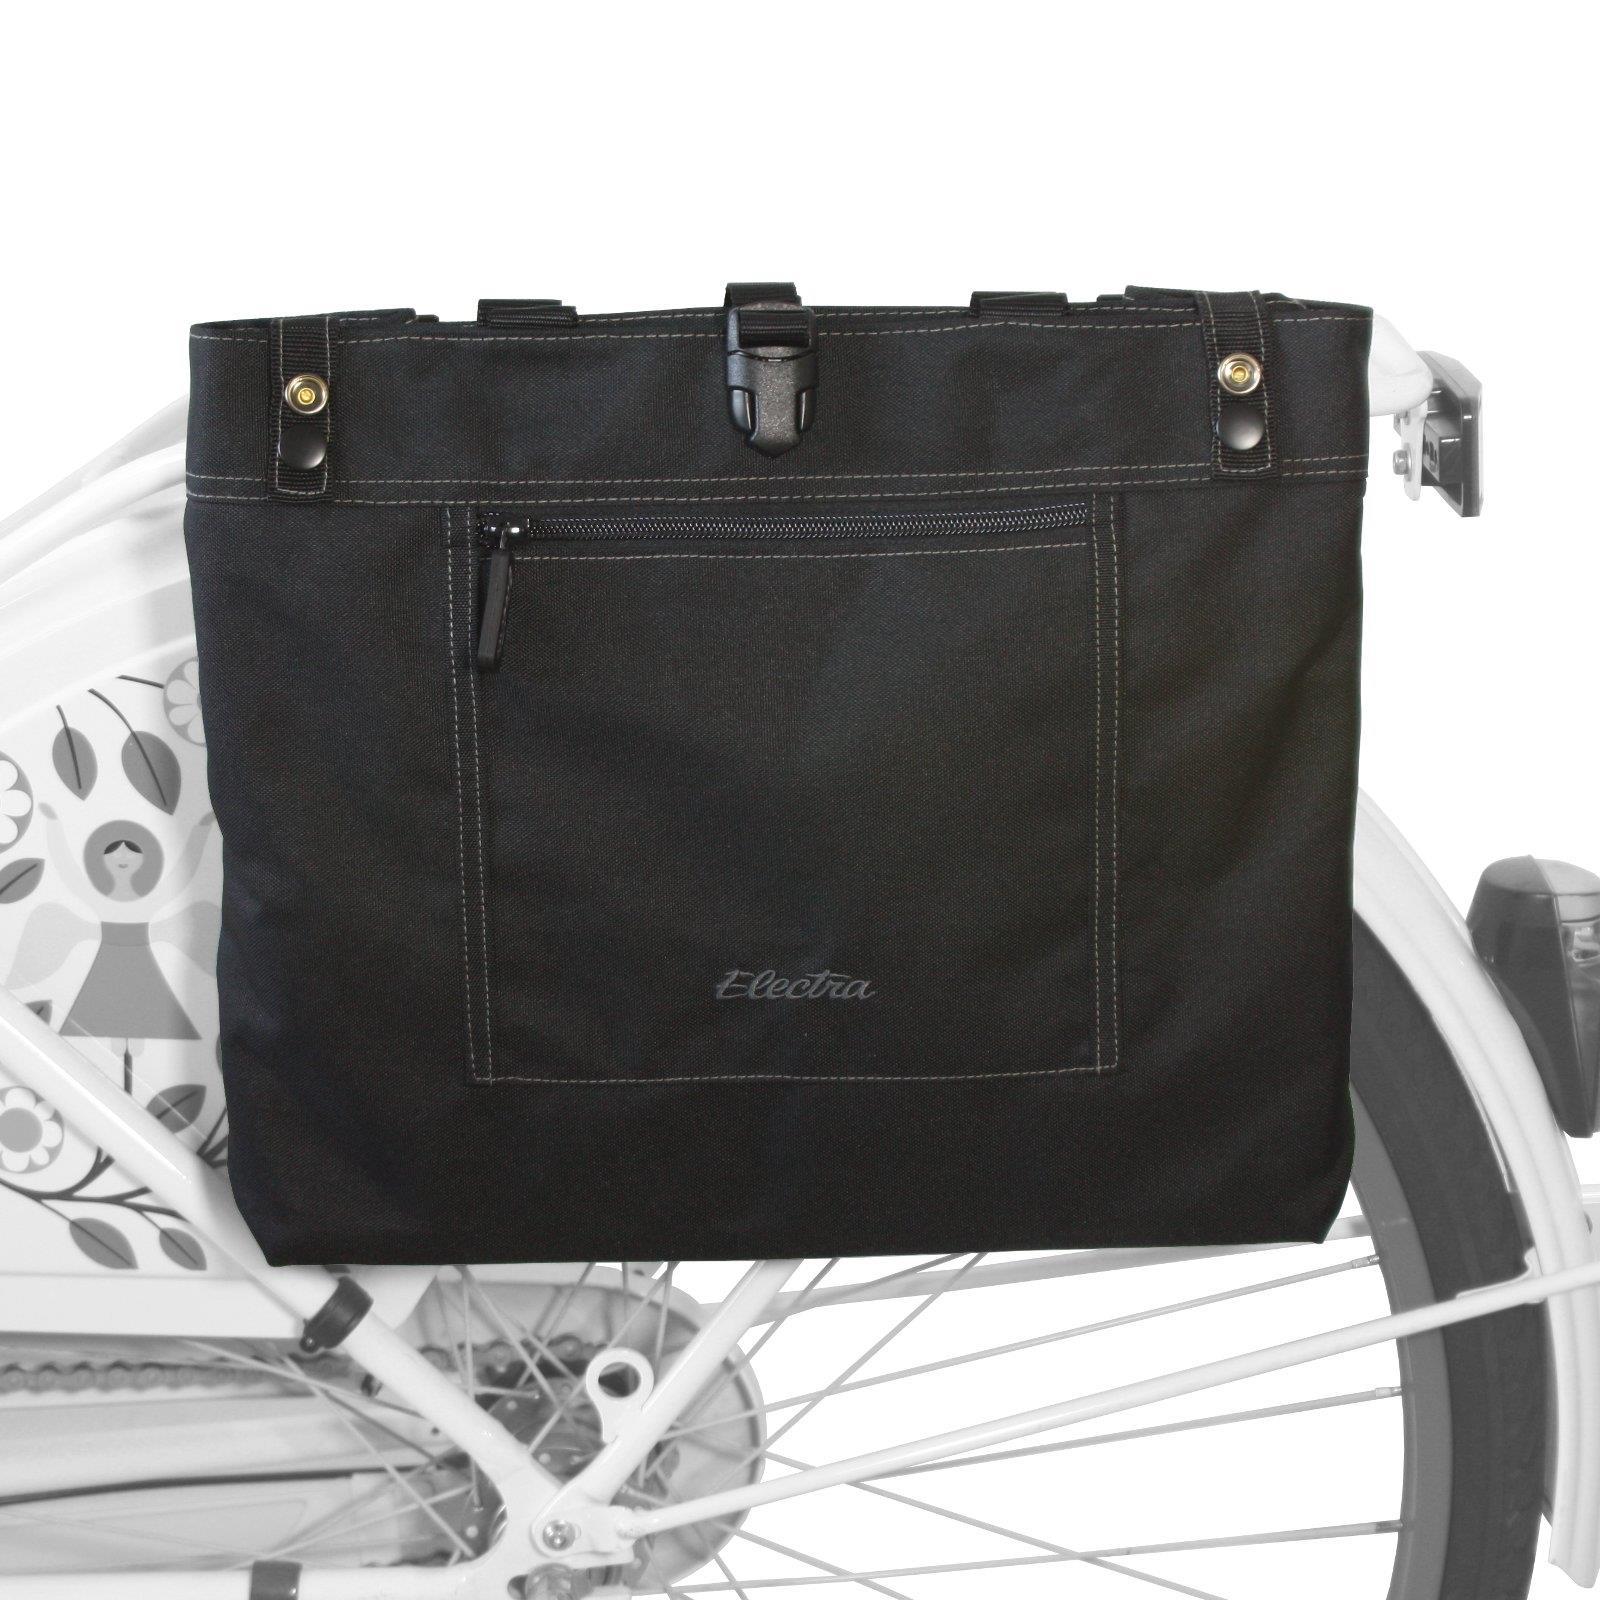 Details zu Electra Fahrrad Trage Tasche Gepäckträger Schulter Messenger Tote Bag Faltbar